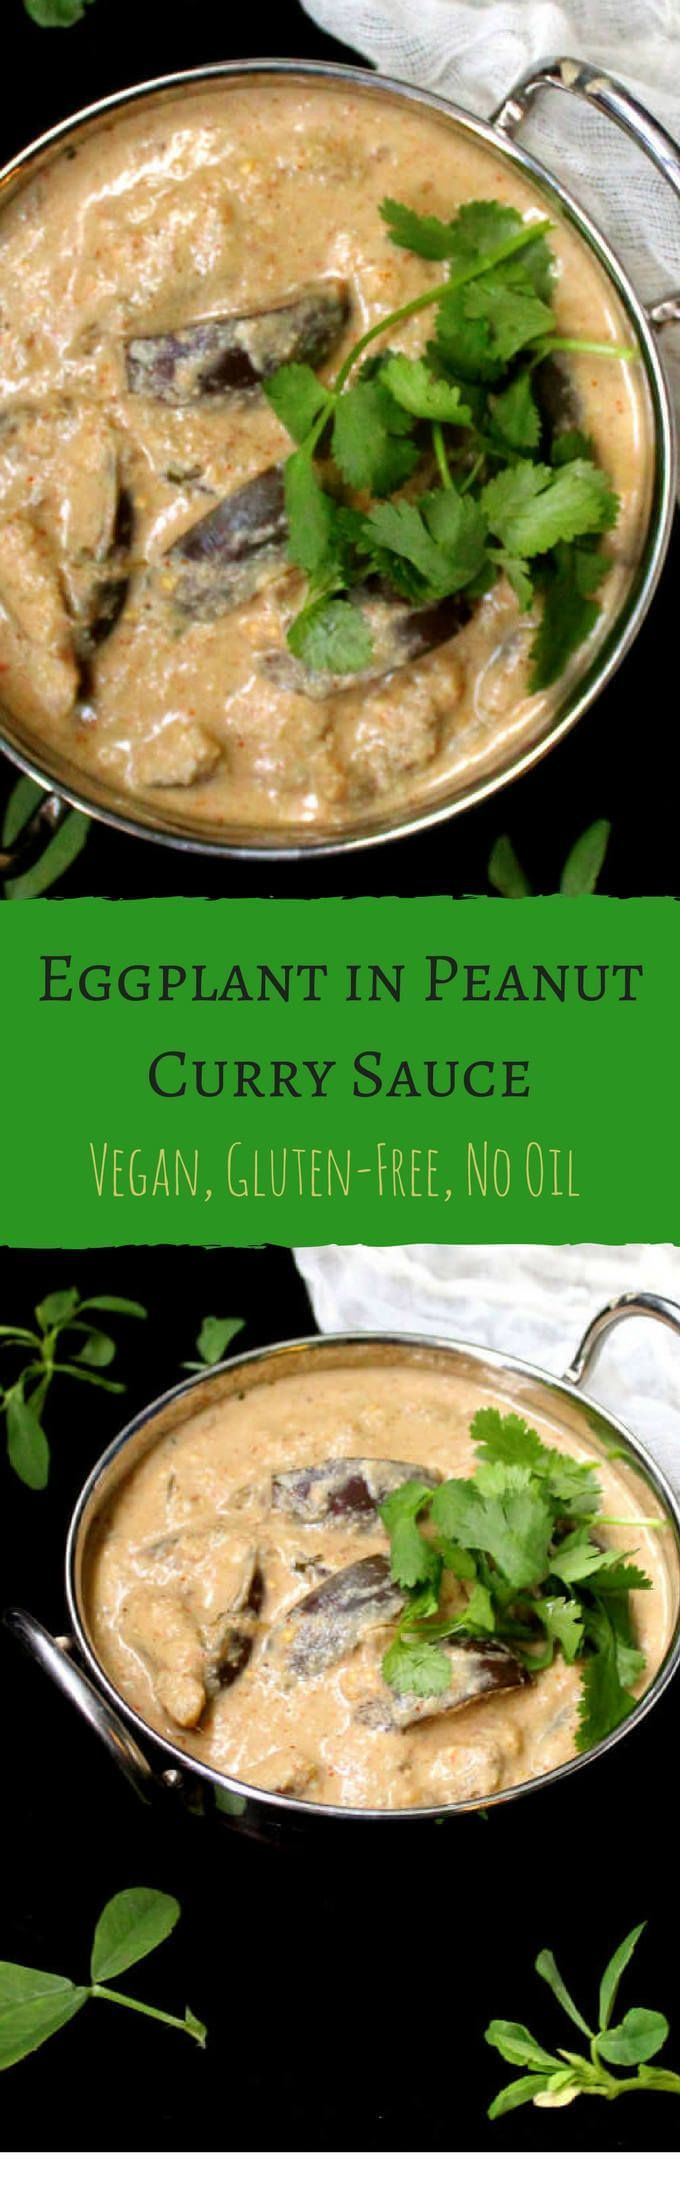 Eggplant in peanut curry sauce, glutenfree, vegan - holycowvegan.net